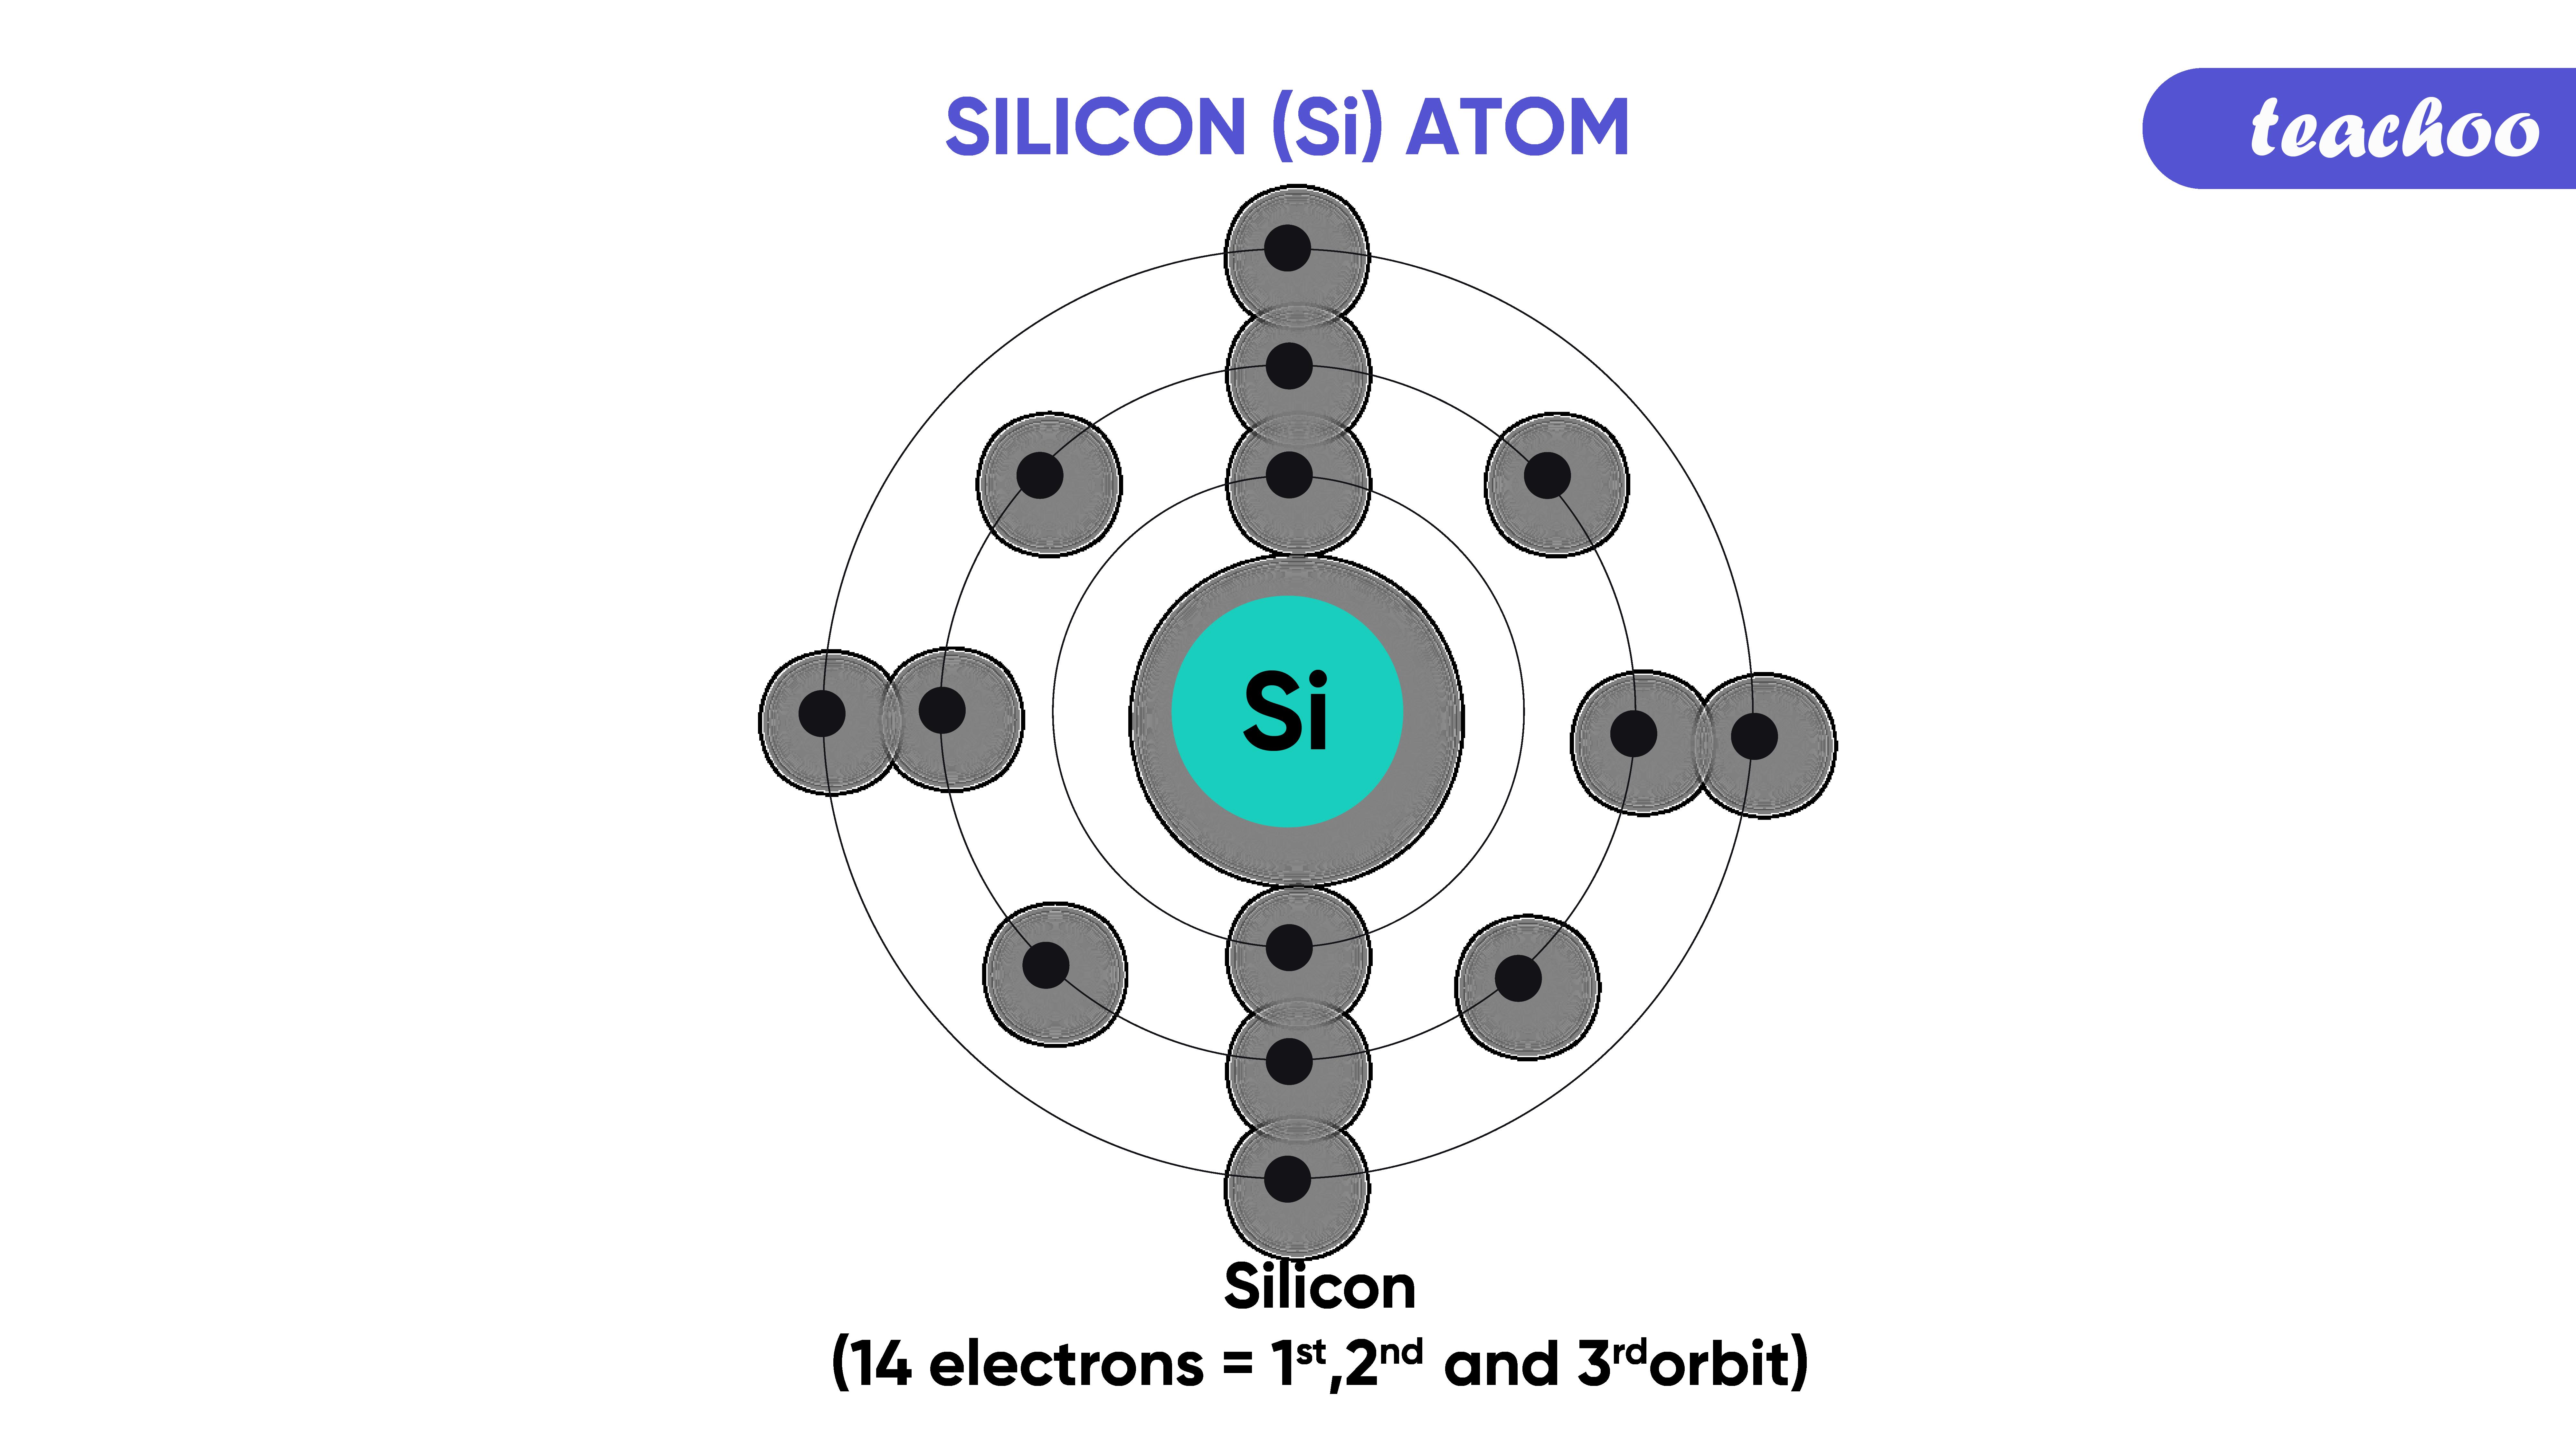 28. silicon-Teachoo-01.png